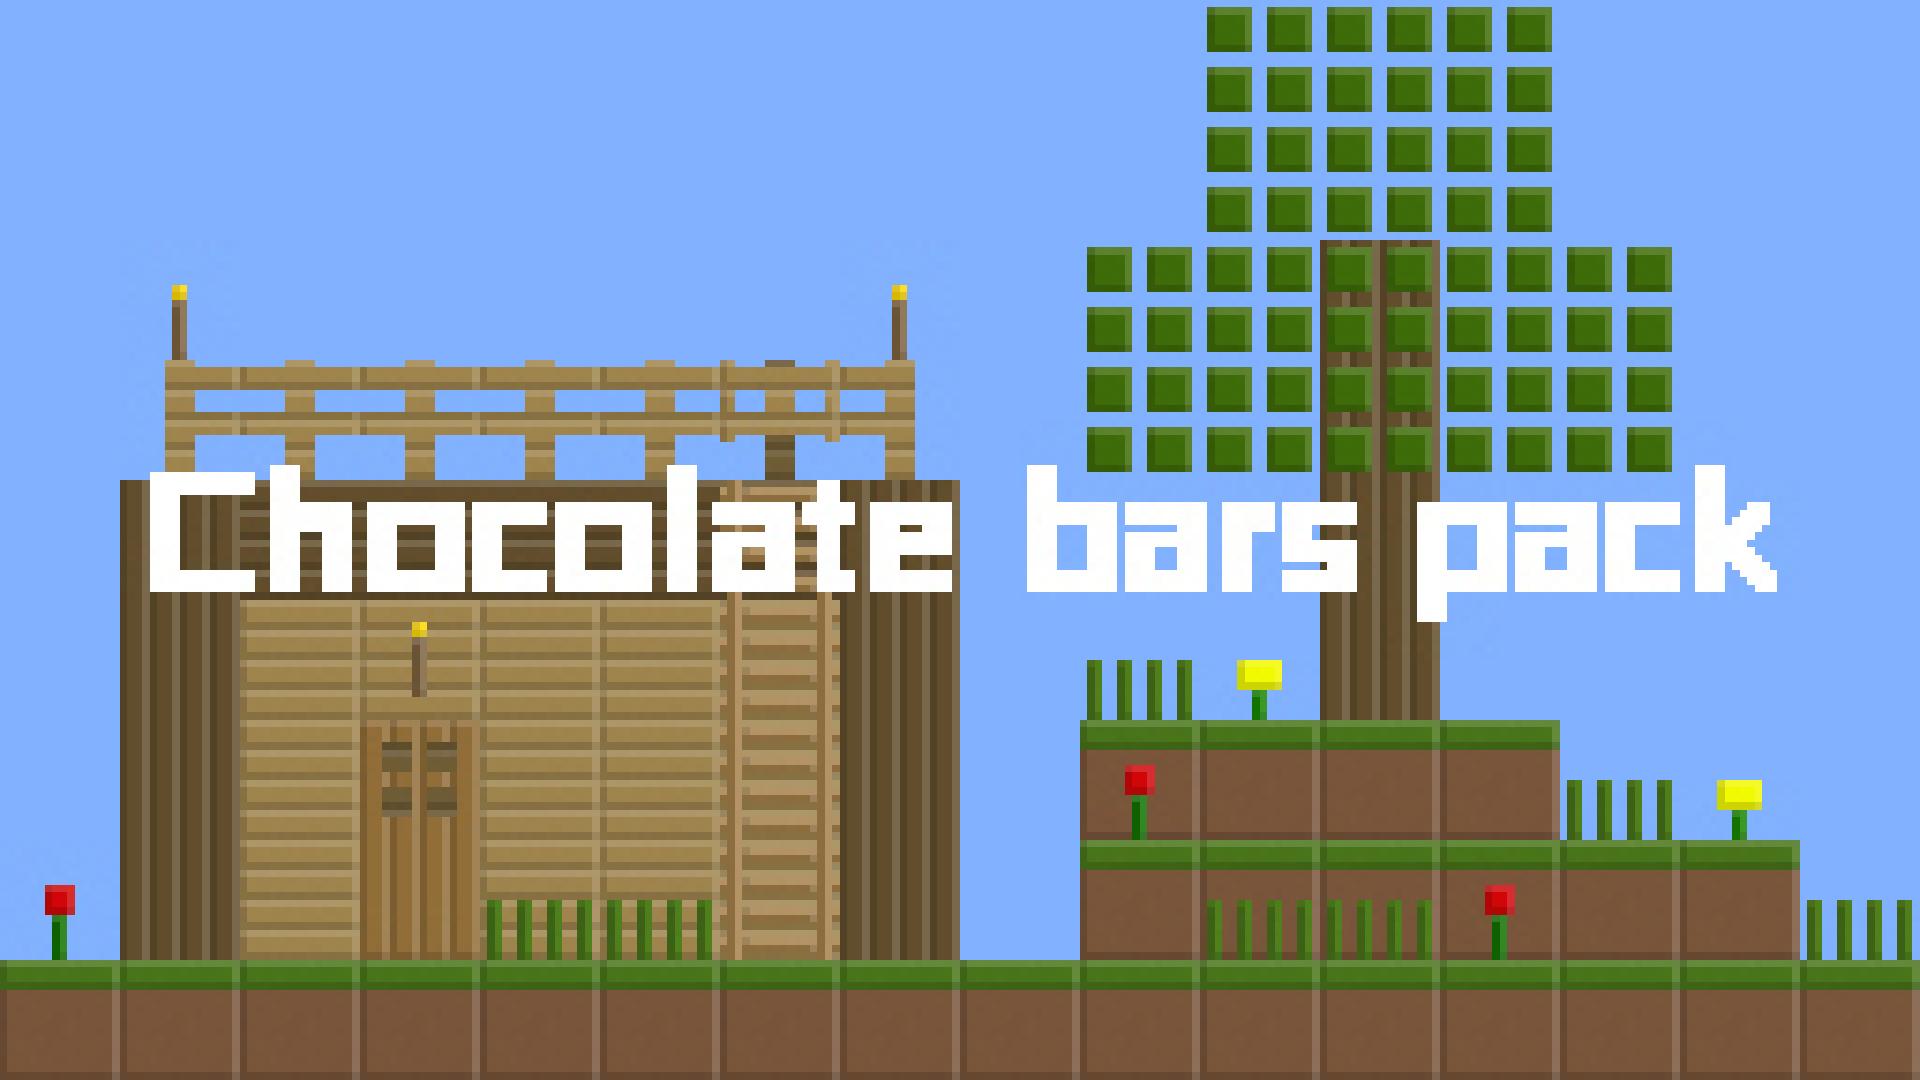 Chocolate bars pack(巧克力材質包)